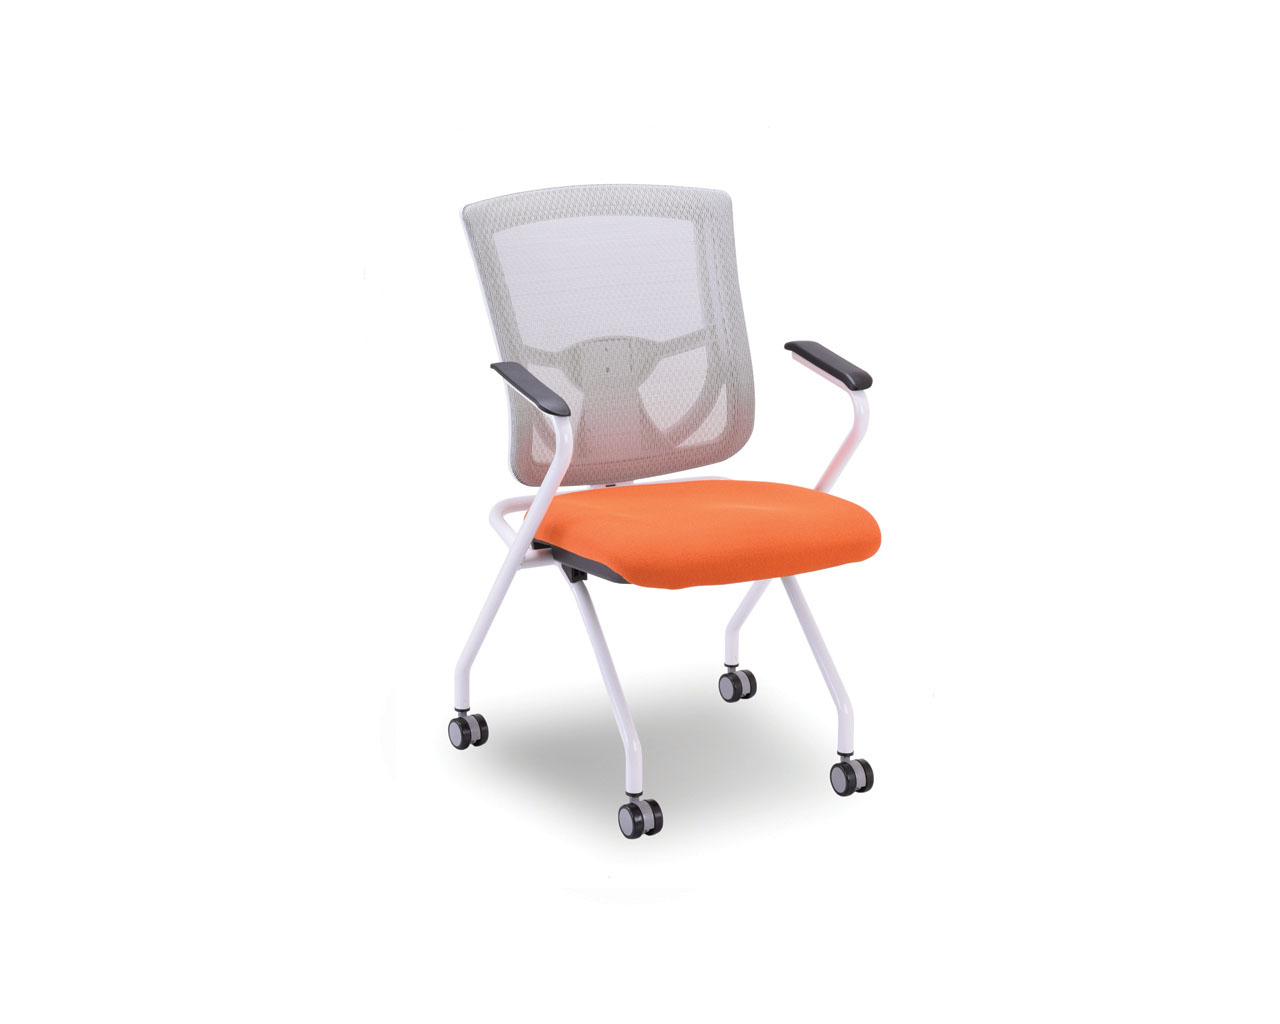 CoolMesh Pro Plus Nesting Chair